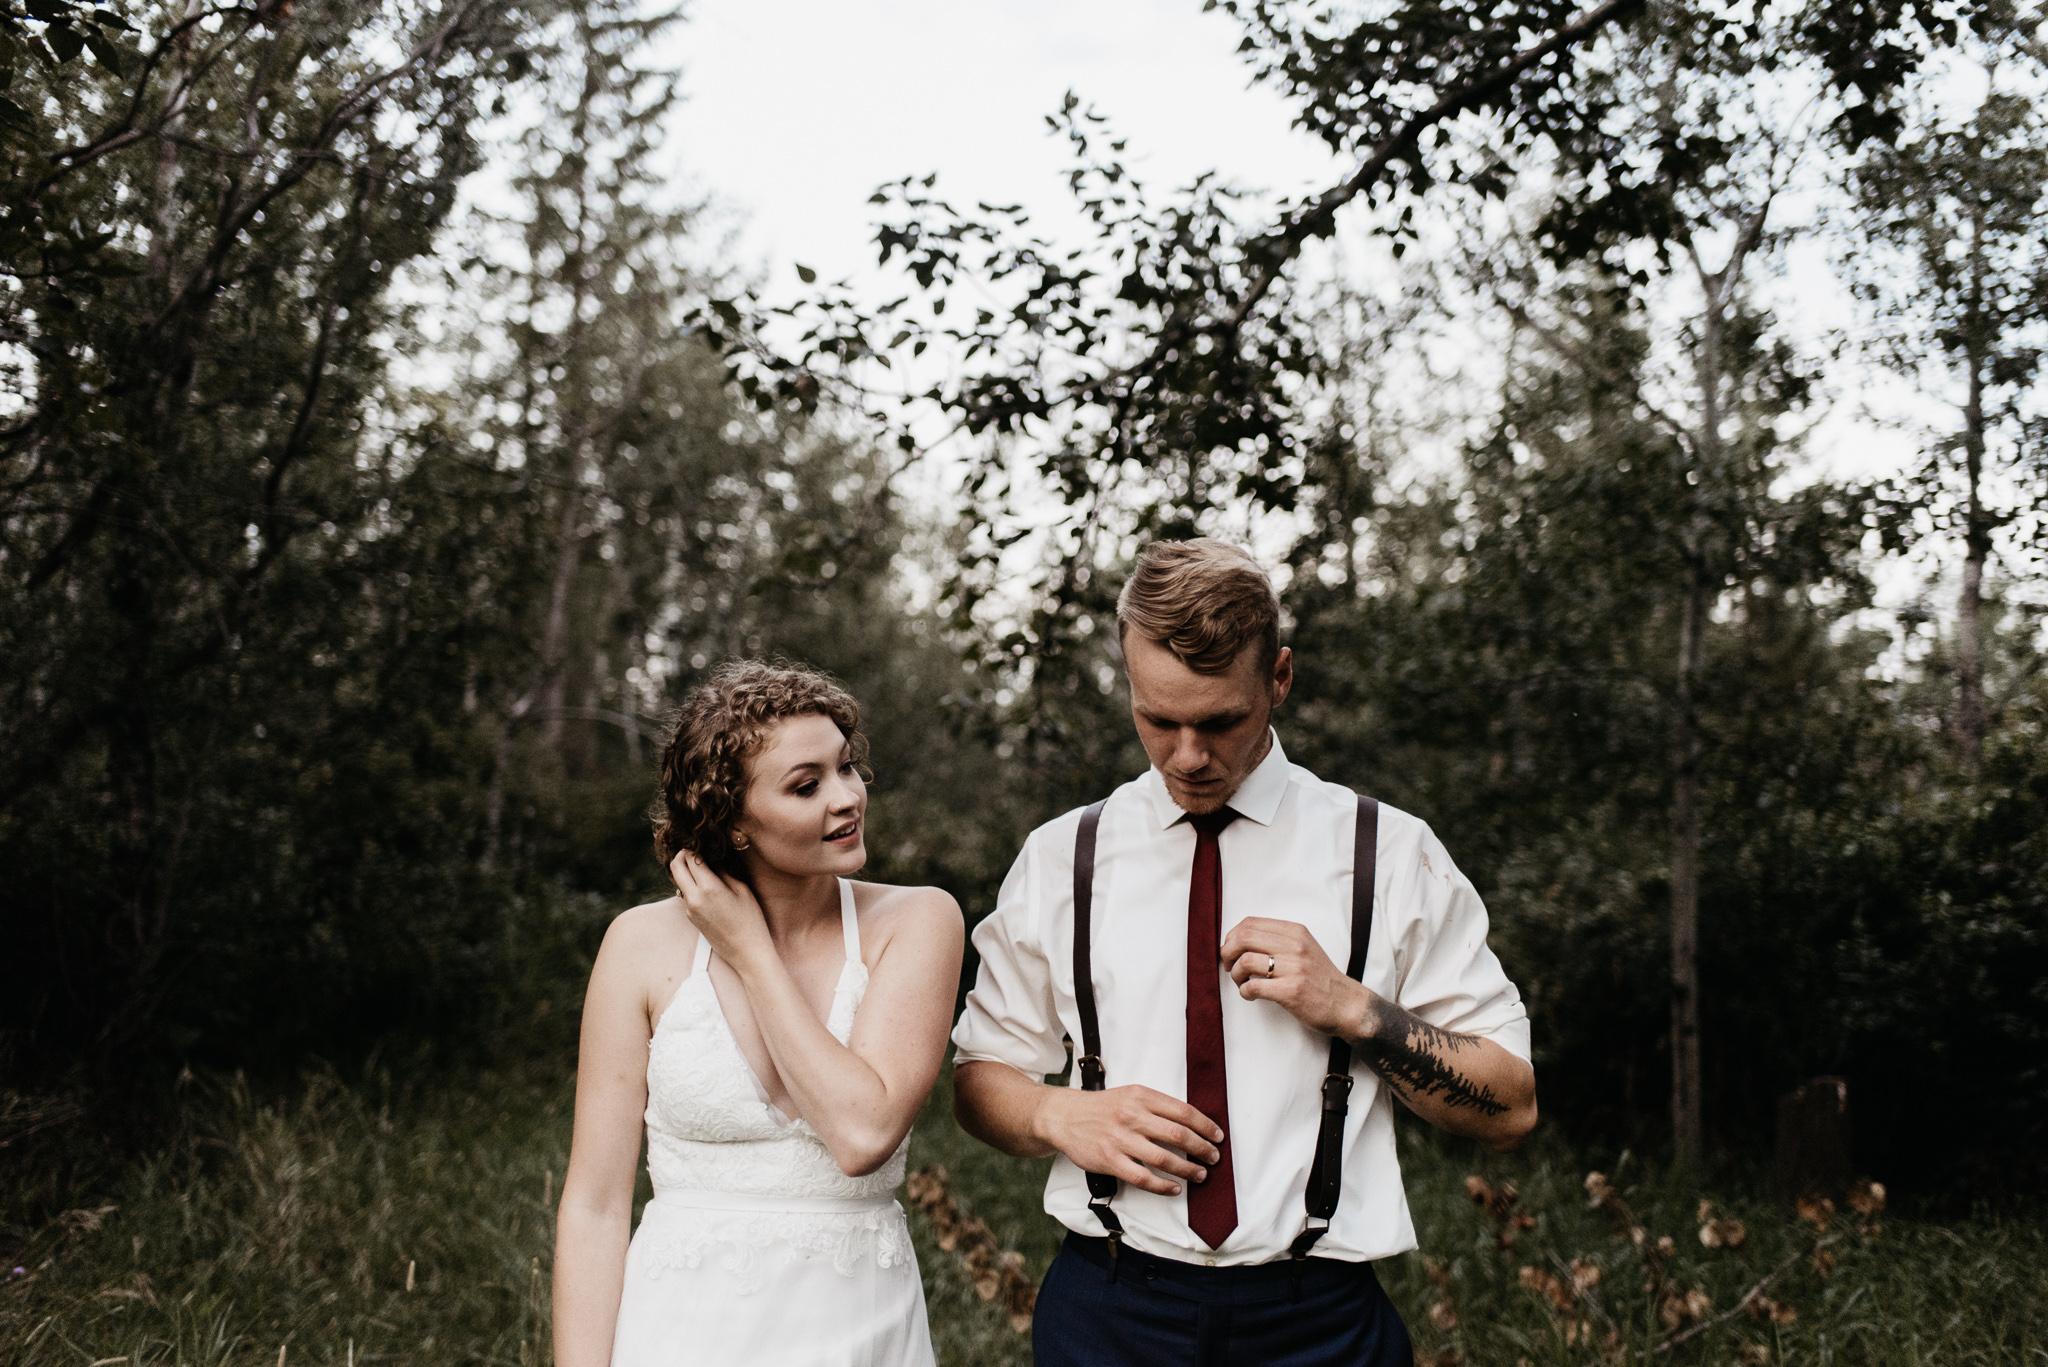 J&C-Weddingblog-122.jpg